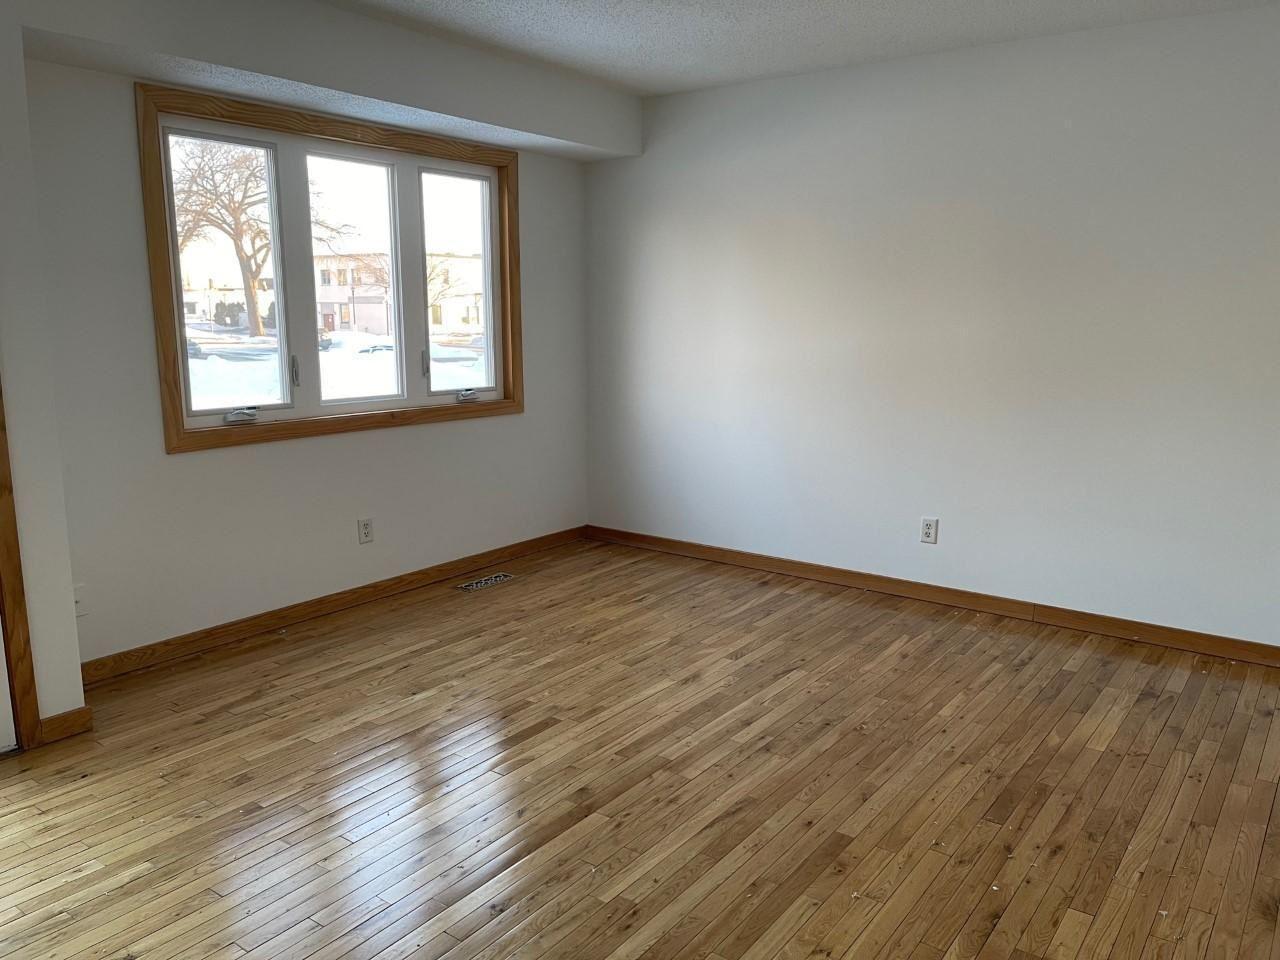 Photo of 890 Hunt Place, Saint Paul, MN 55114 (MLS # 5697701)